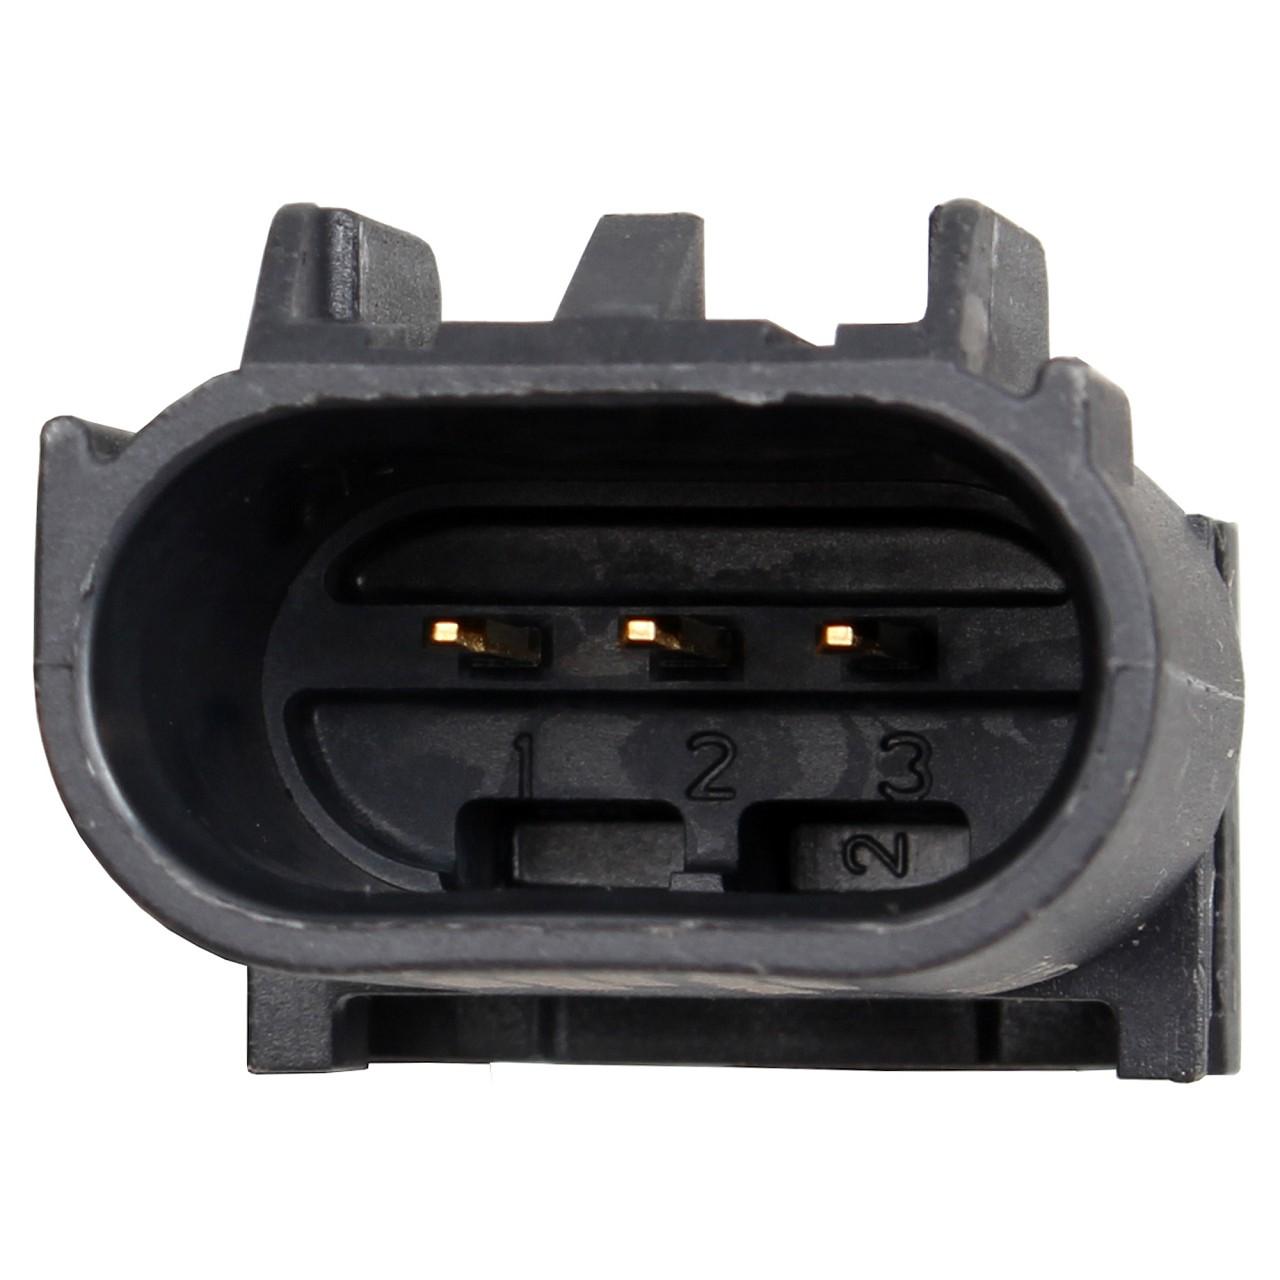 ORIGINAL Ford Abgasdrucksensoren Drucksensor TRANSIT 2.2TDCi ab 01.2014 1931554